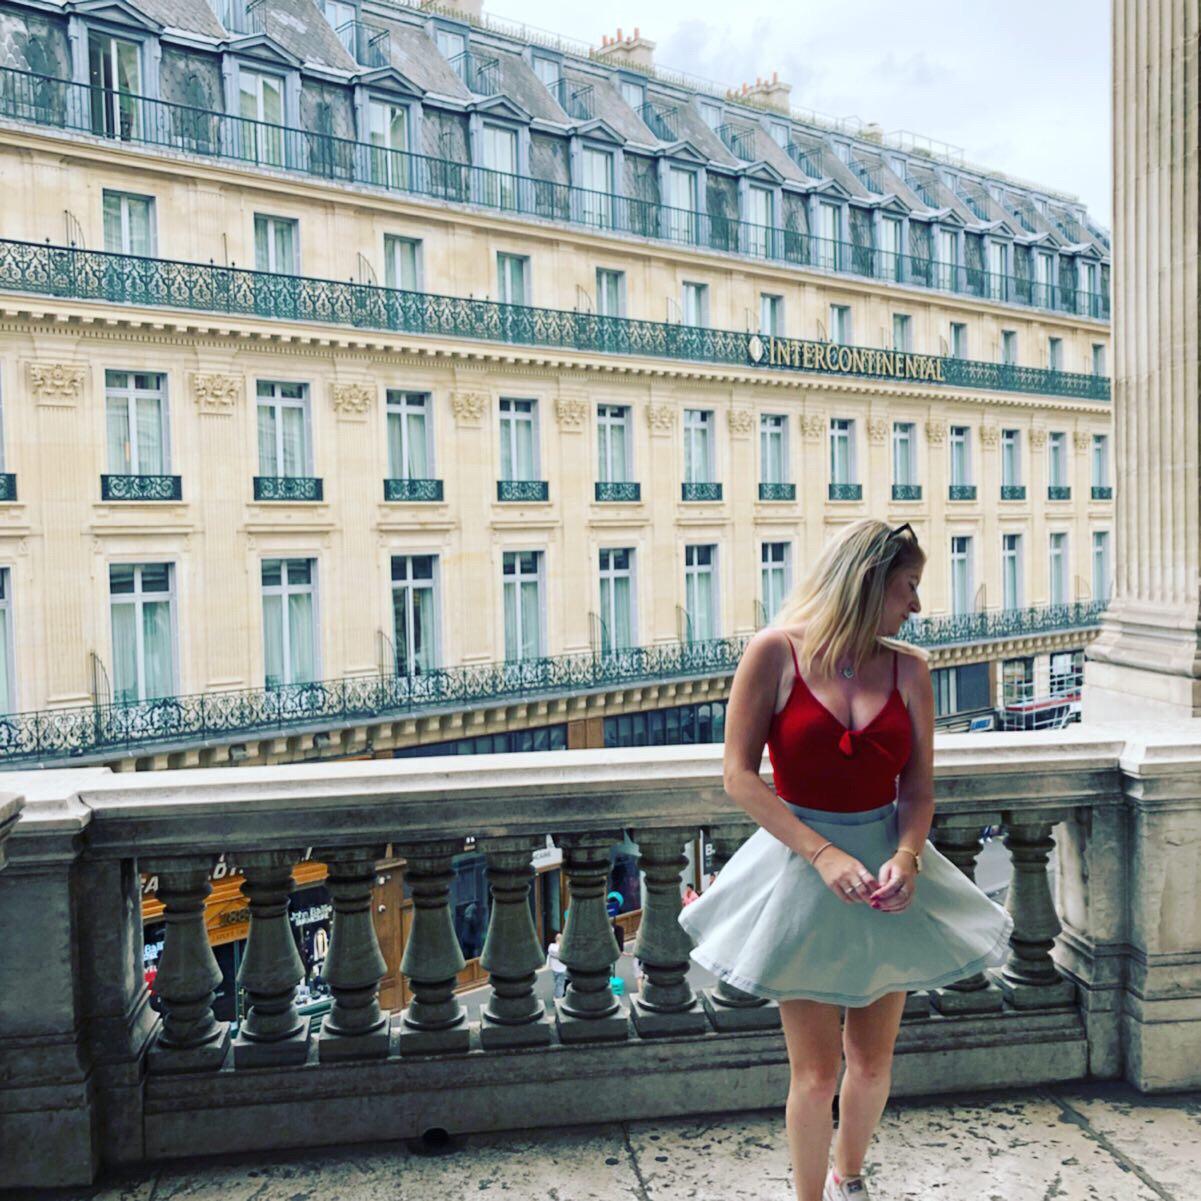 The balcony at Palais Garnier Paris